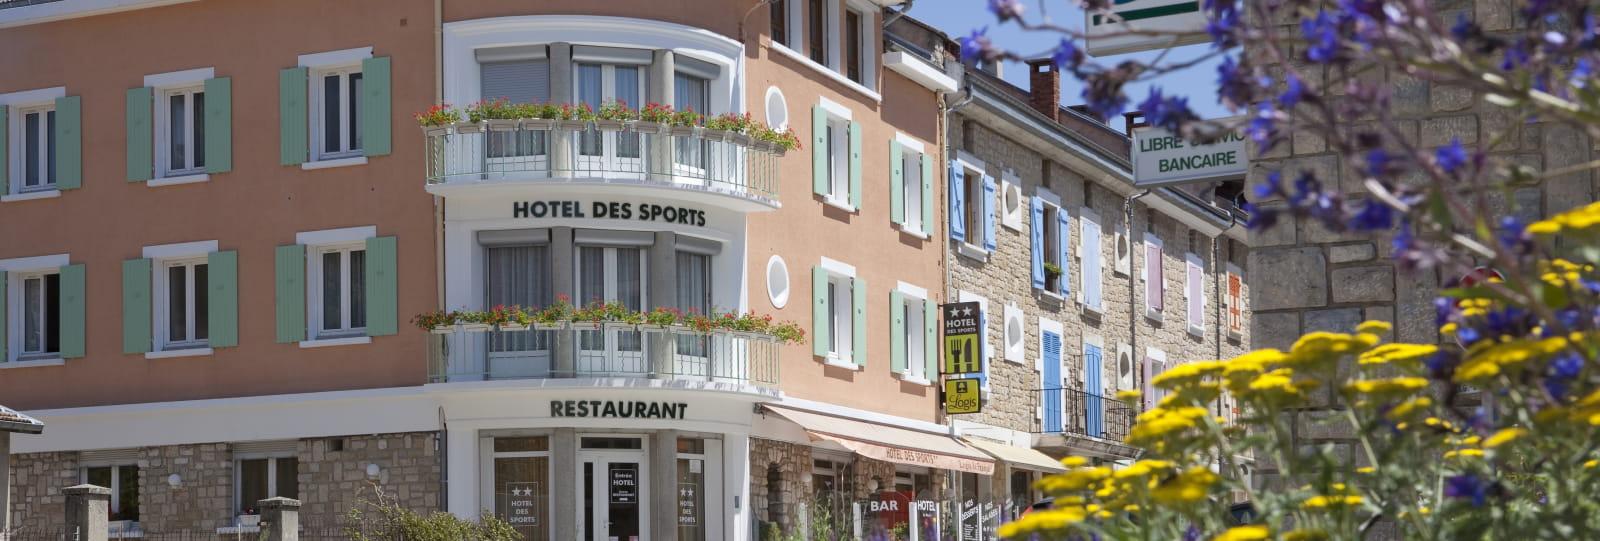 Hôtel-Restaurant des Sports